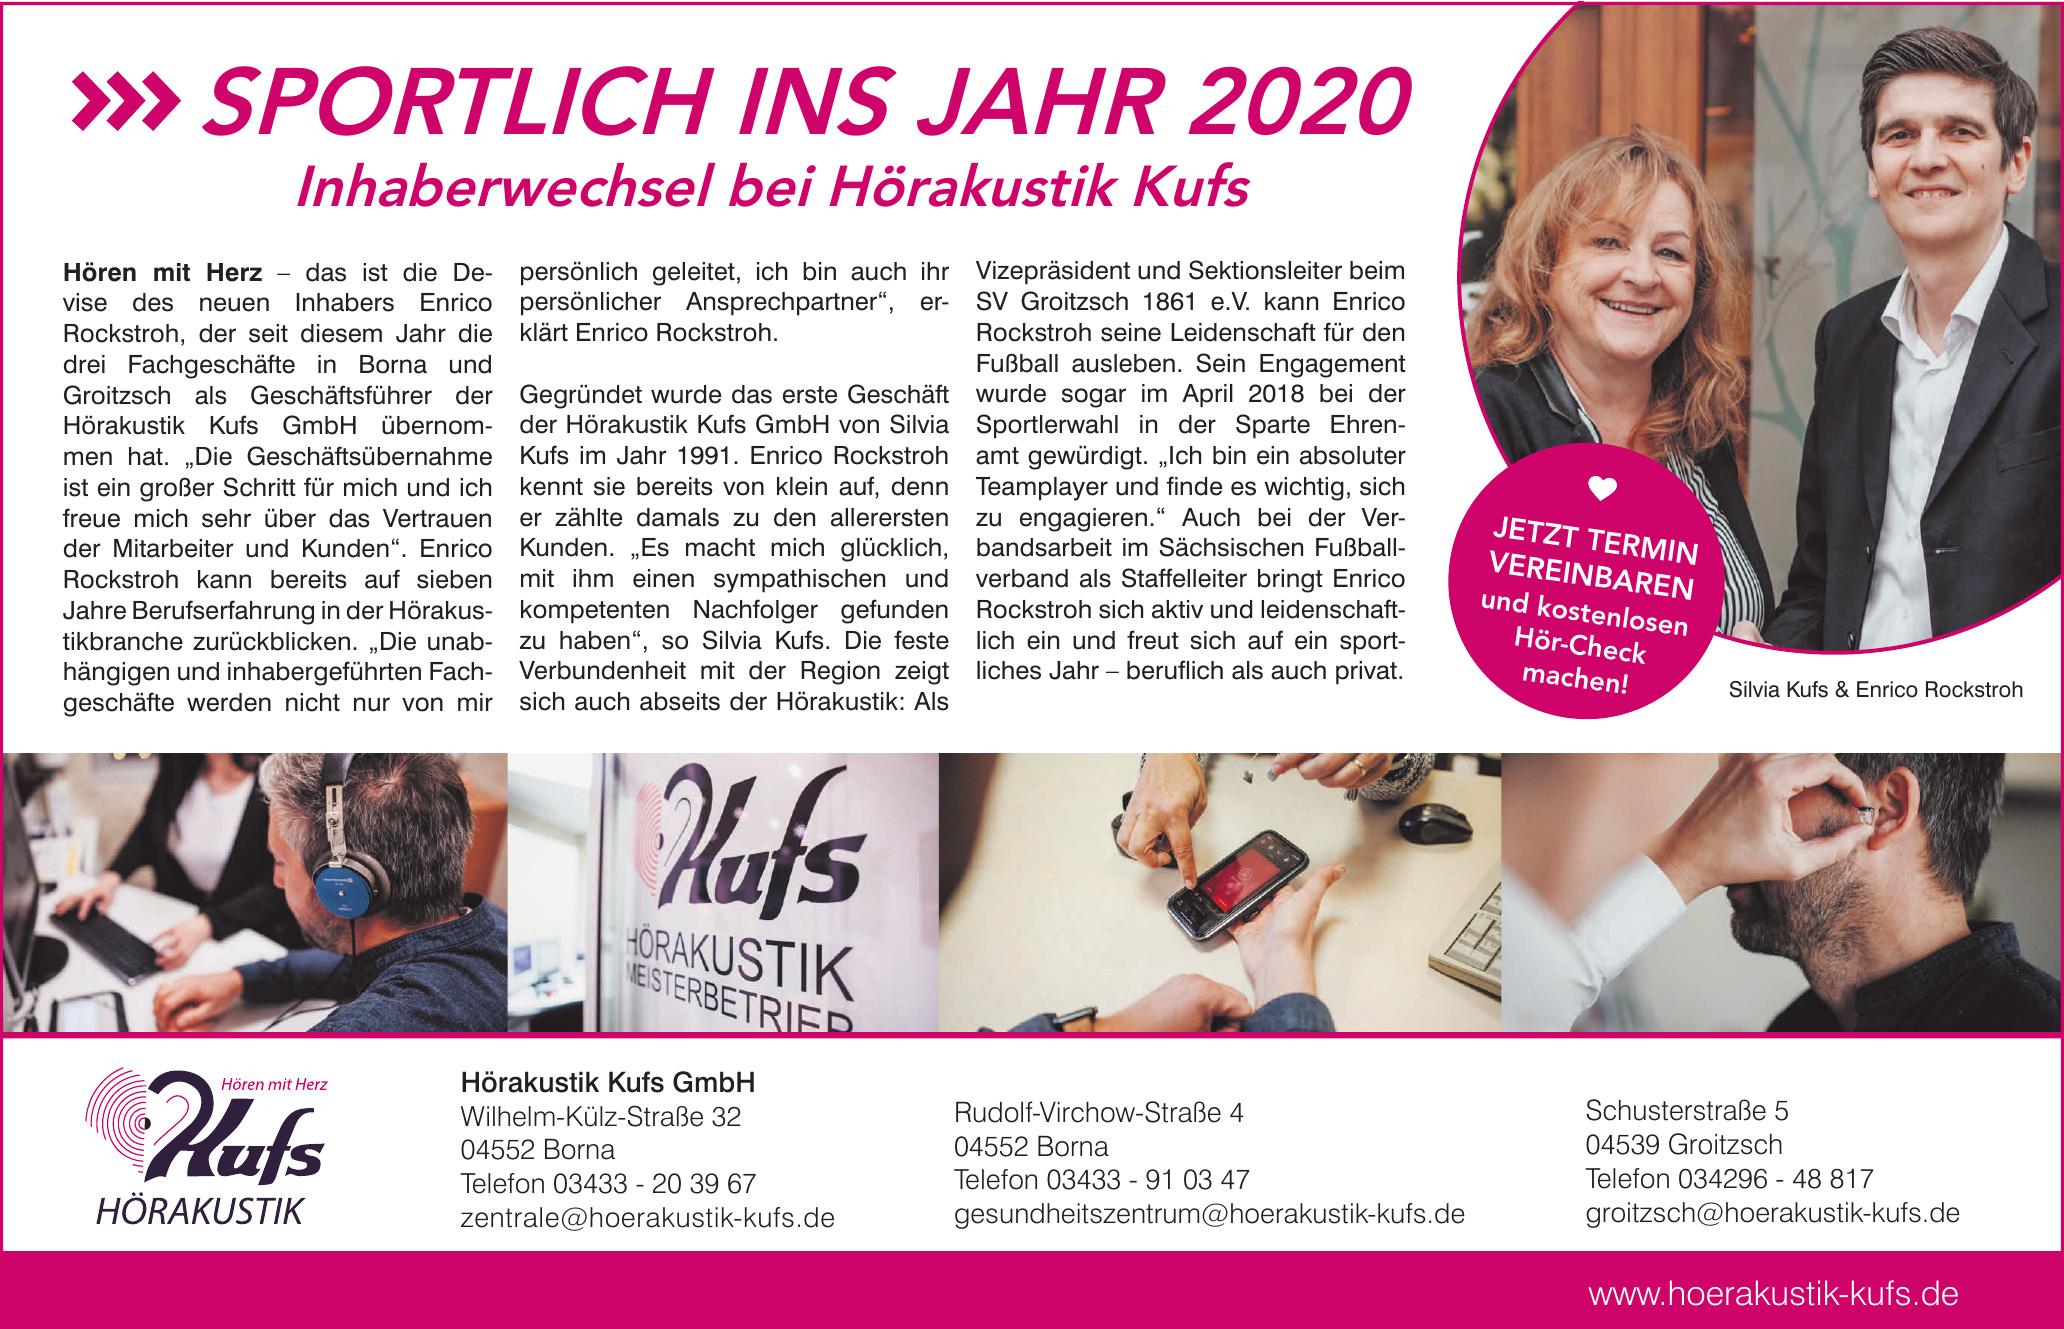 Hörakustik Kufs GmbH